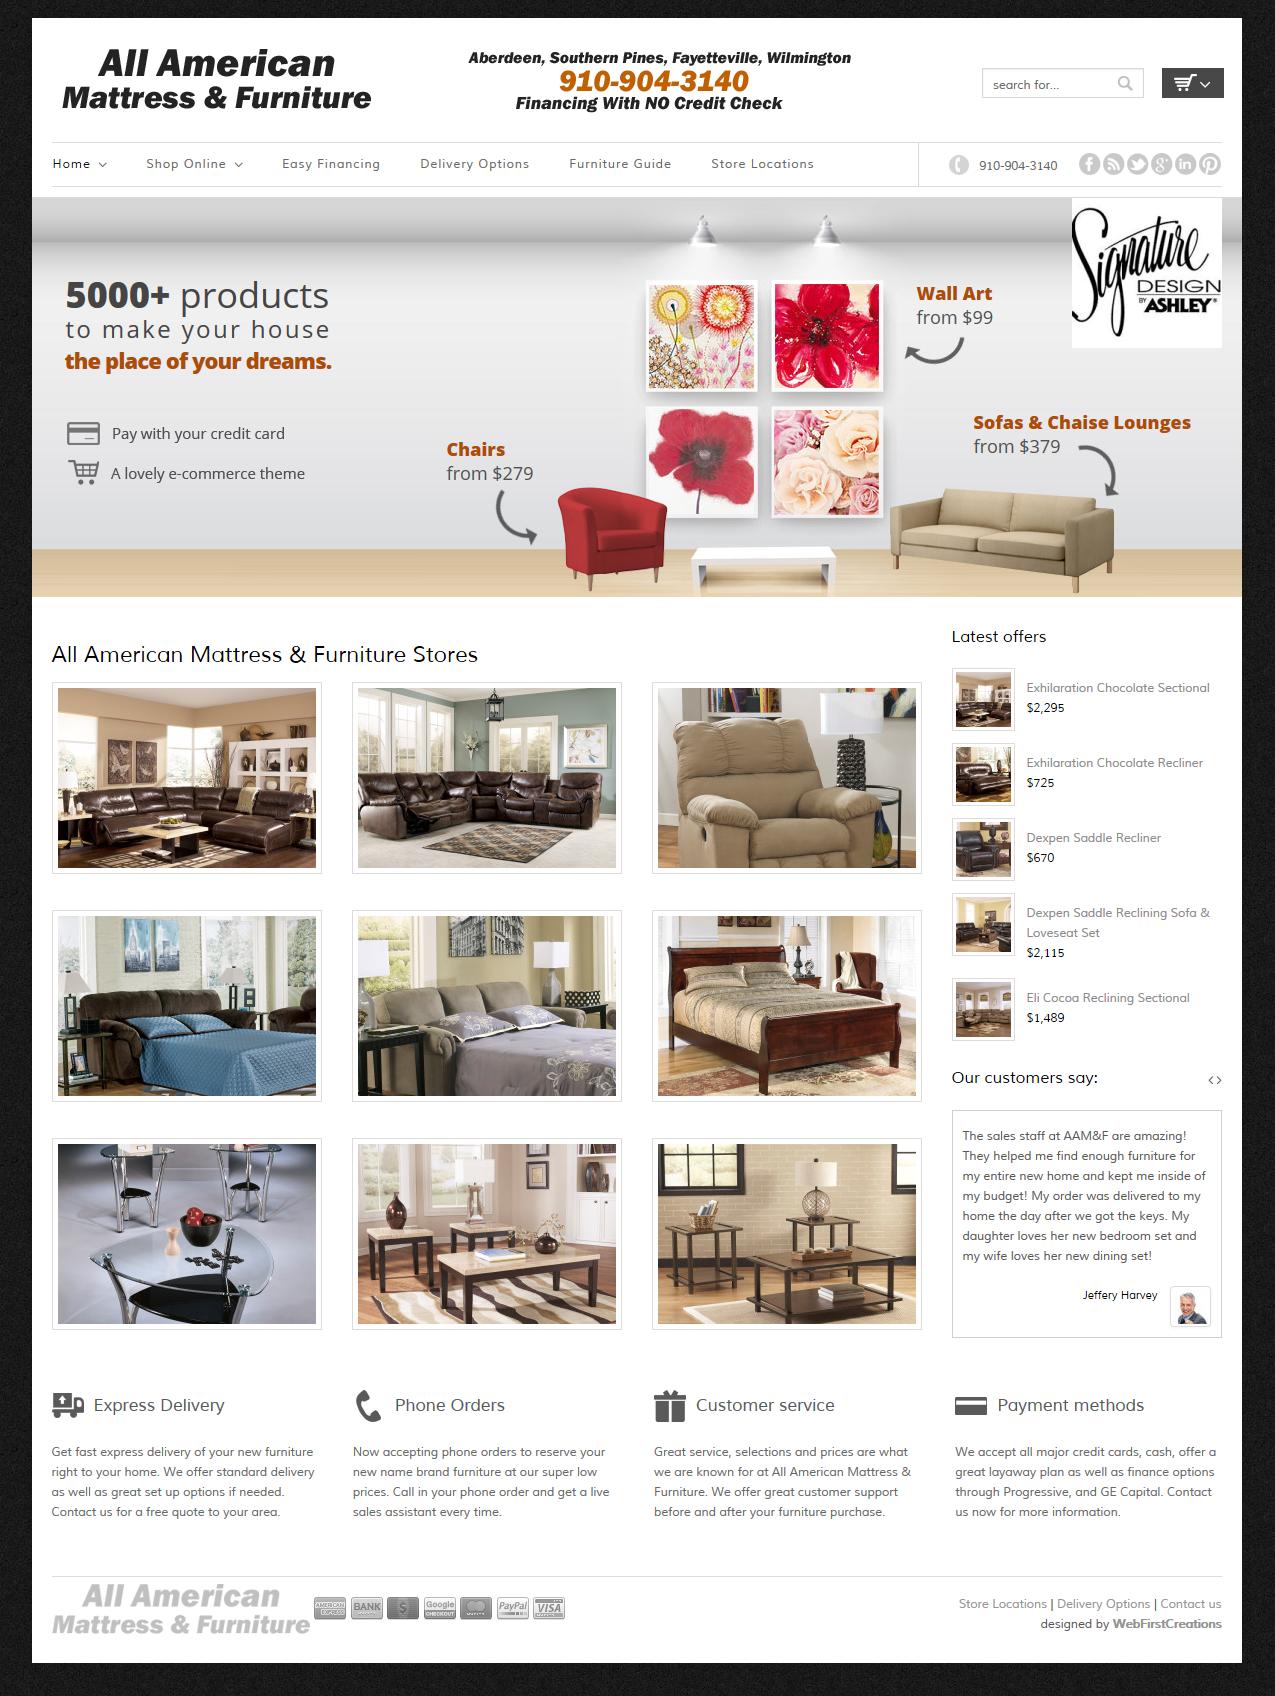 New shopping cart site for All American Mattress & Furniture of Aberdeen NC